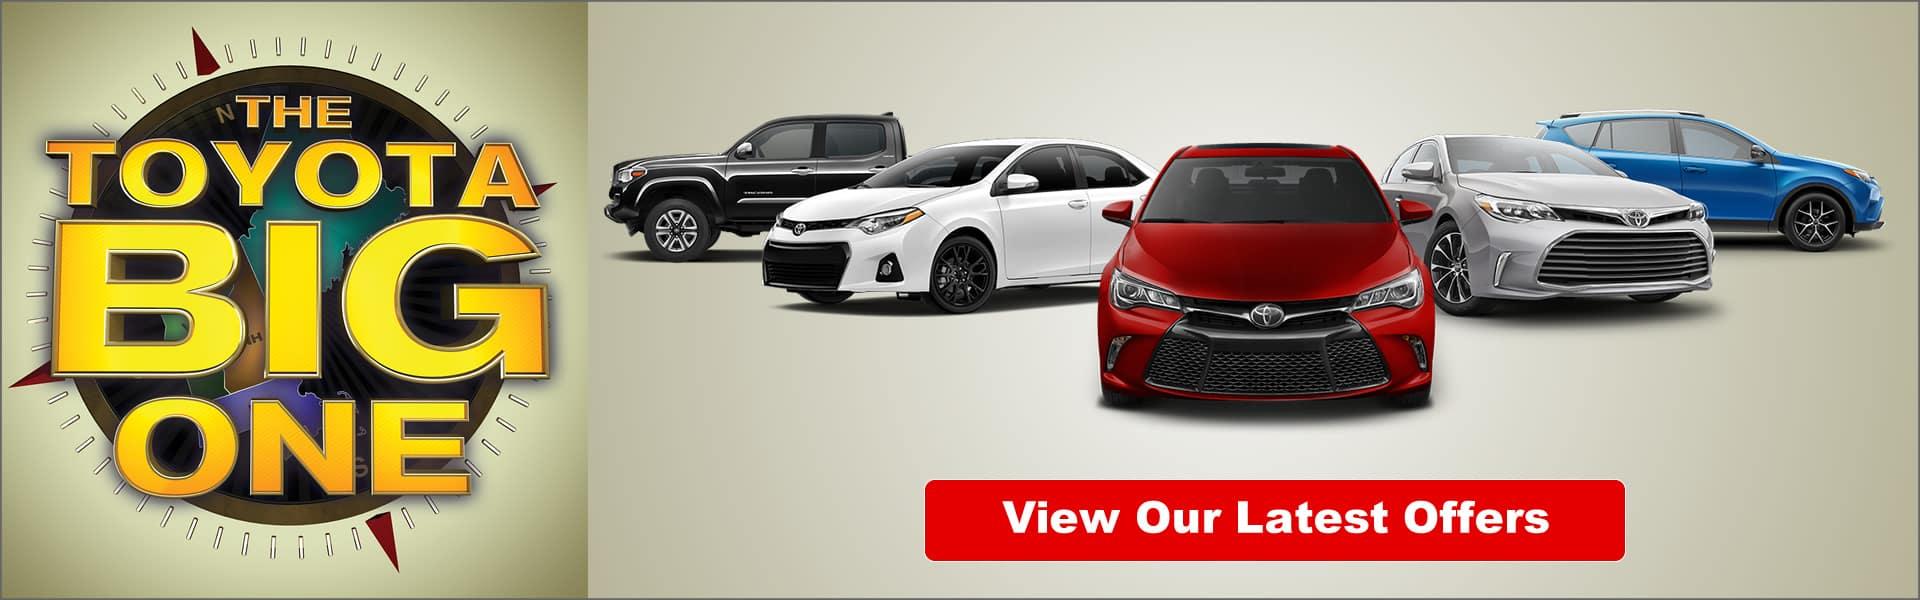 Boston Toyota Dealer Expressway Toyota Serving Quincy